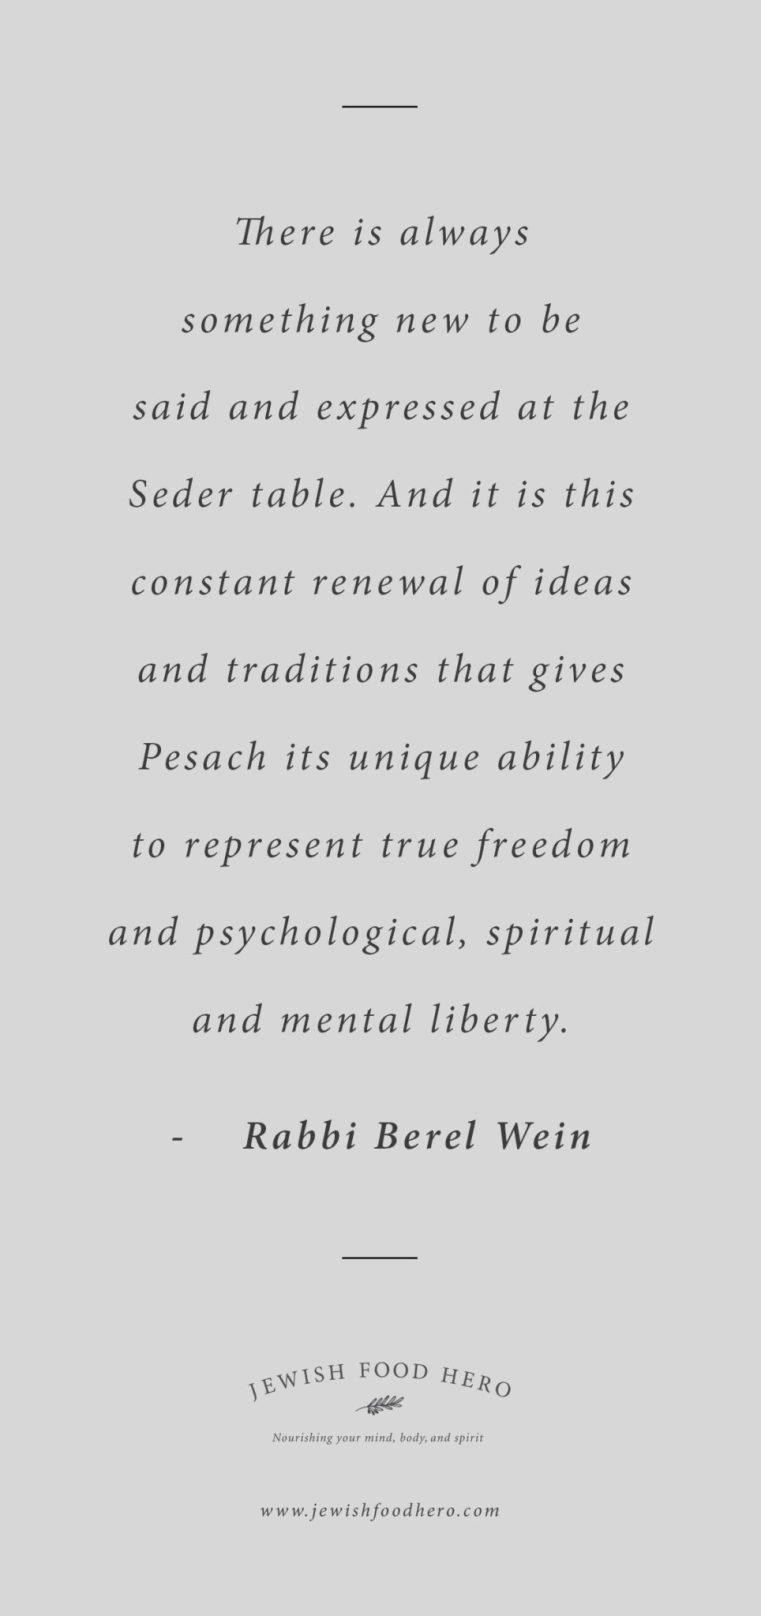 Rabbi Berel Wein quotes, Jewish quotes on freedom